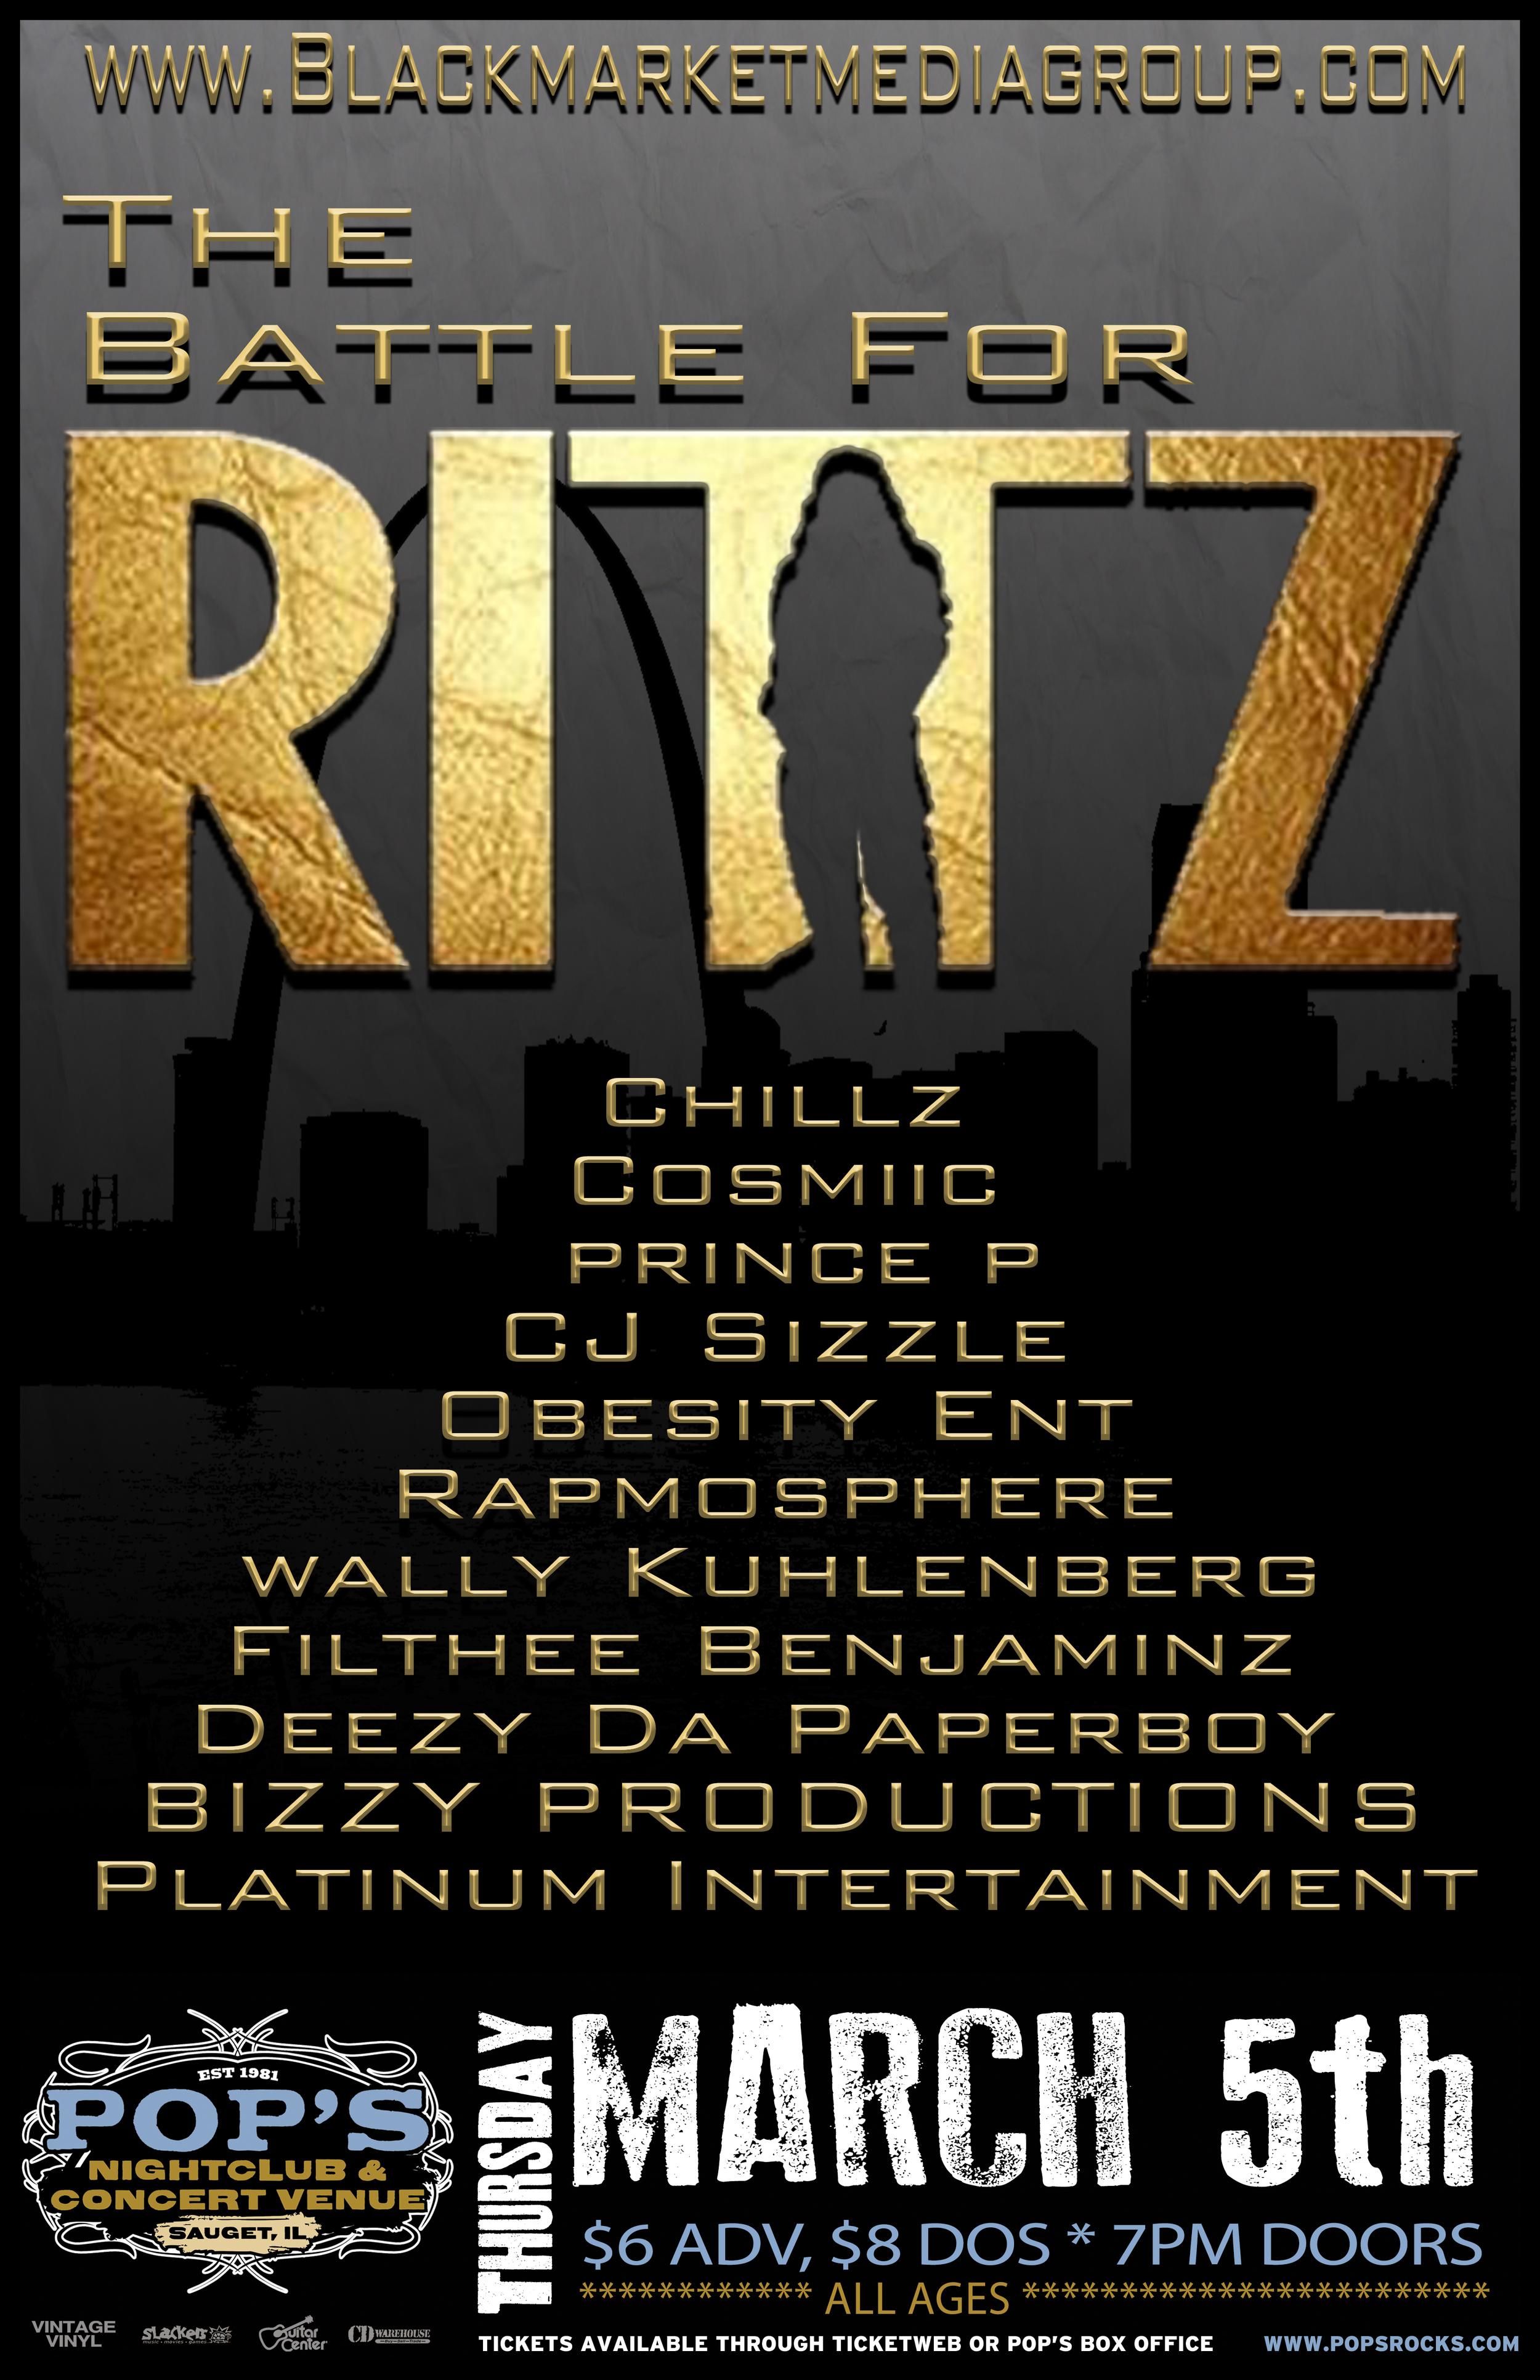 BATTLE FOR RITTZ.jpg